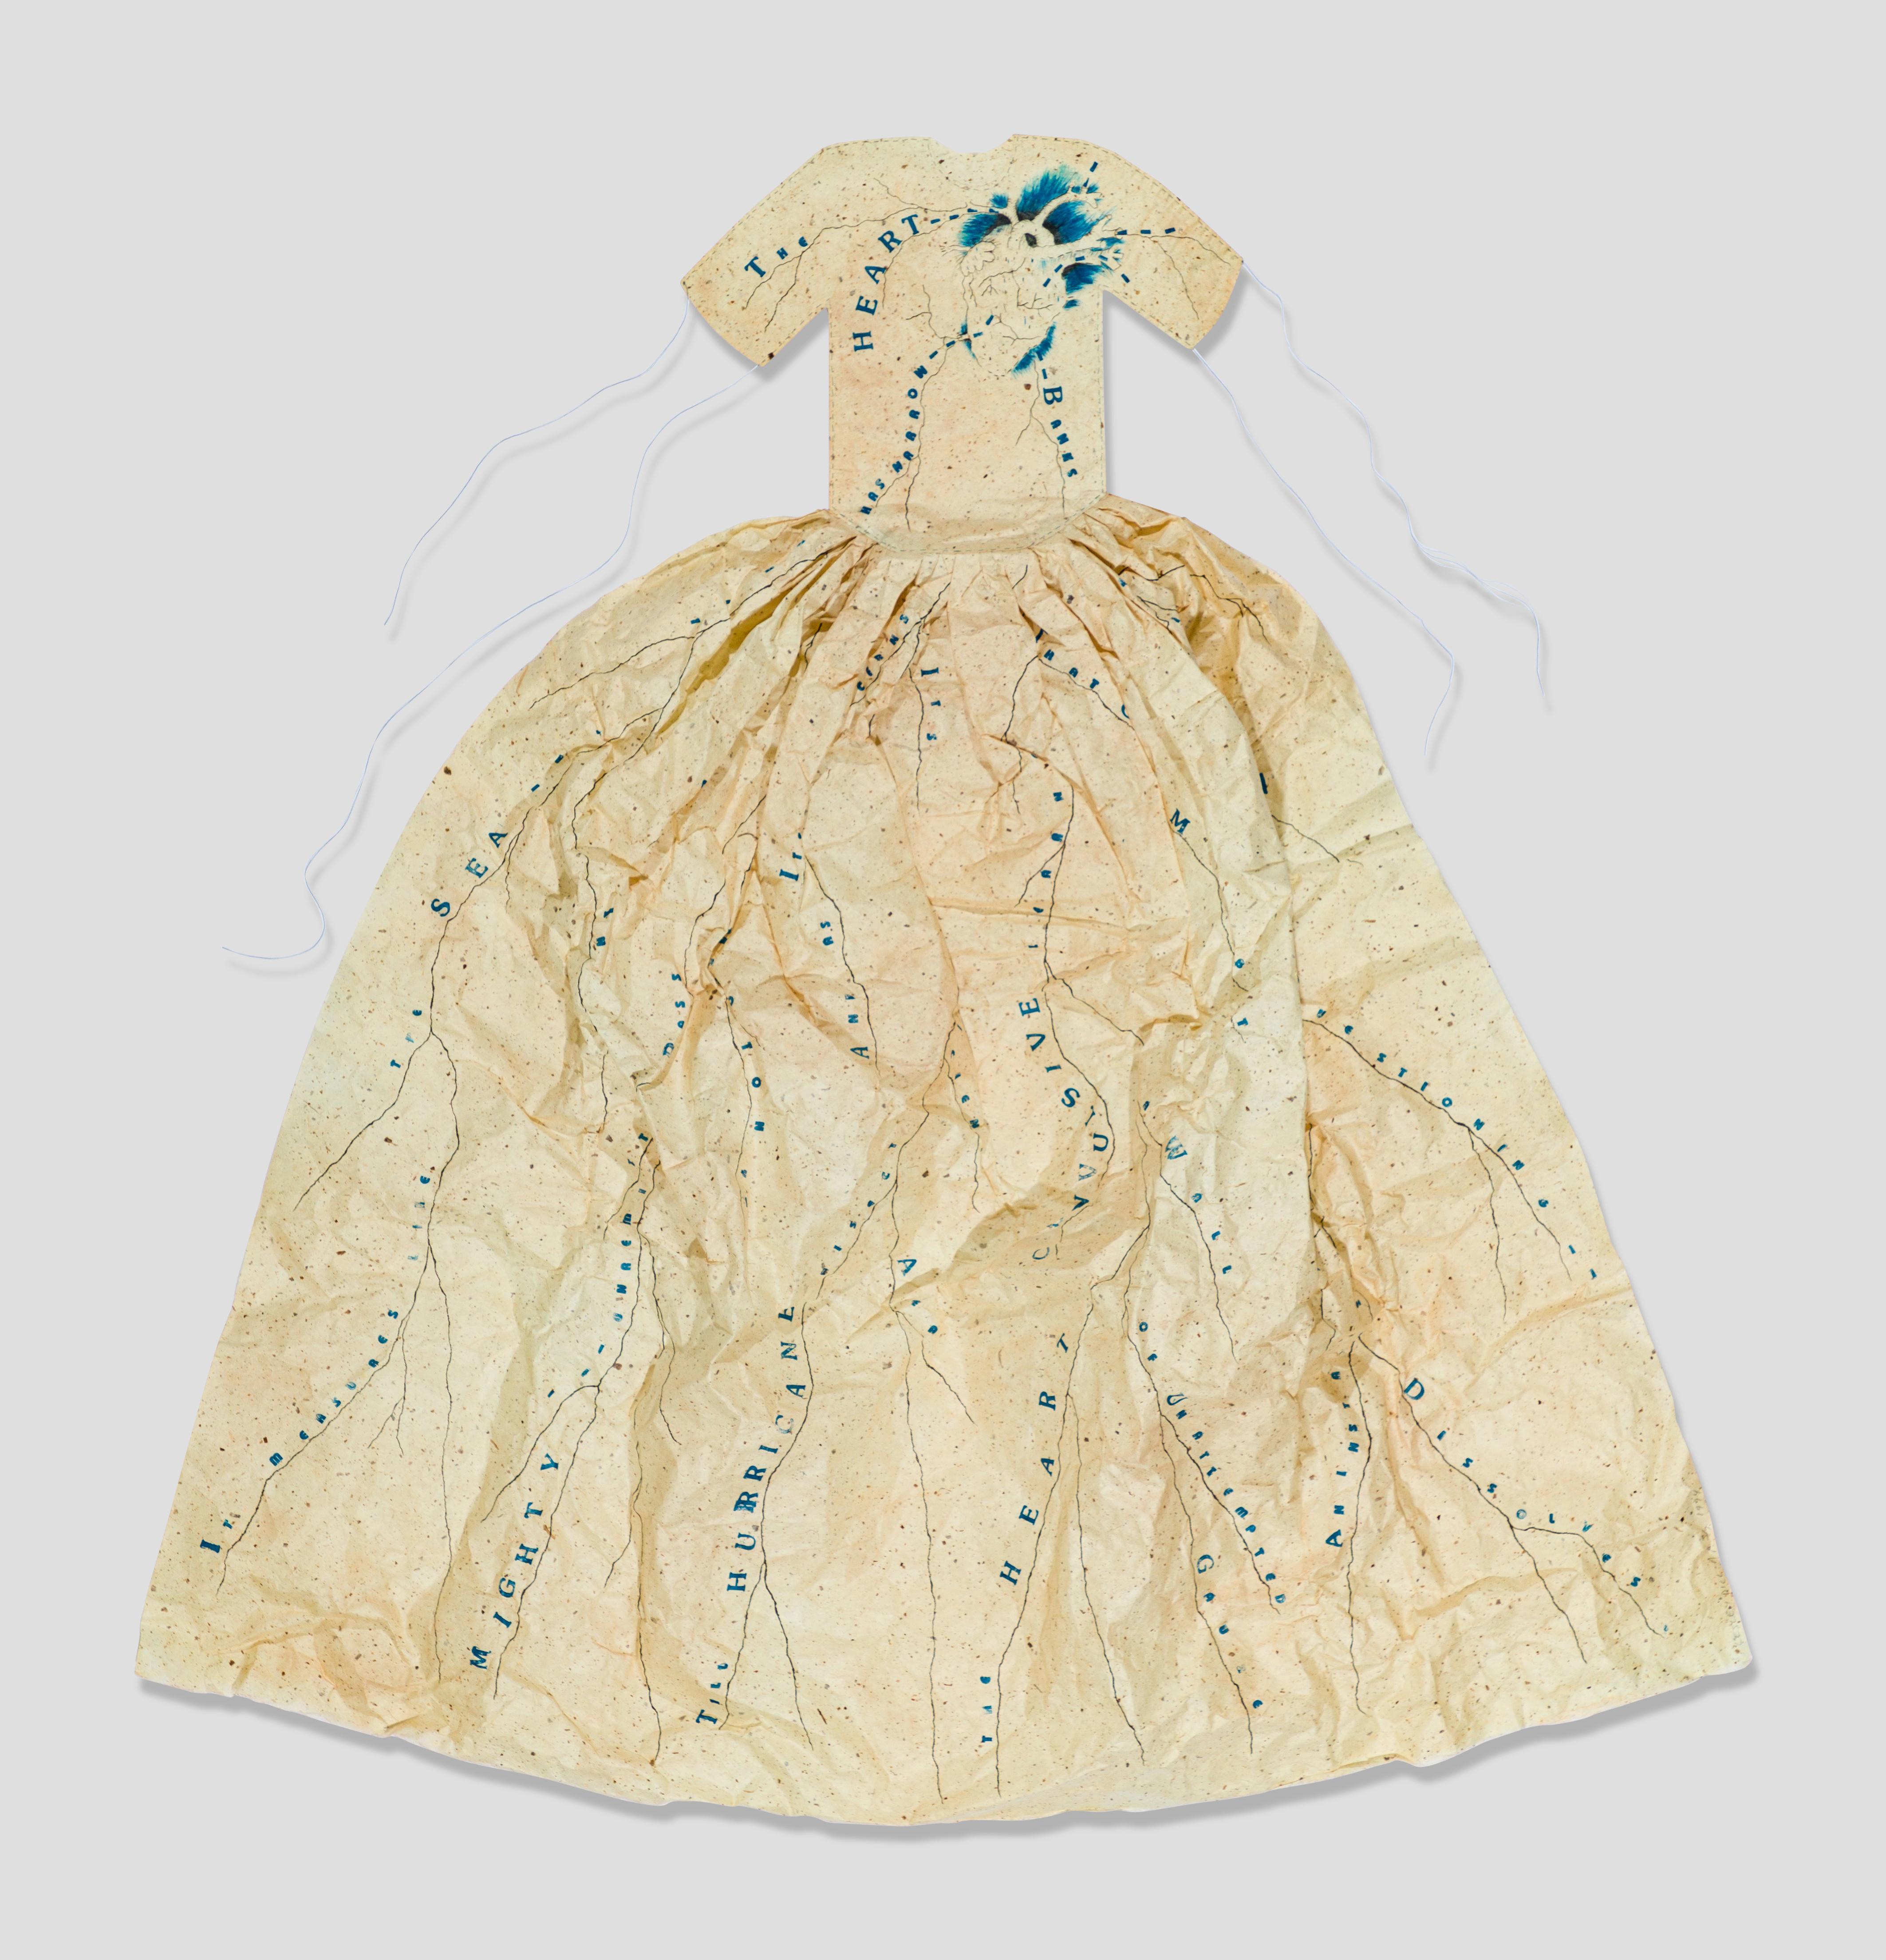 Poem Dress of Circulation